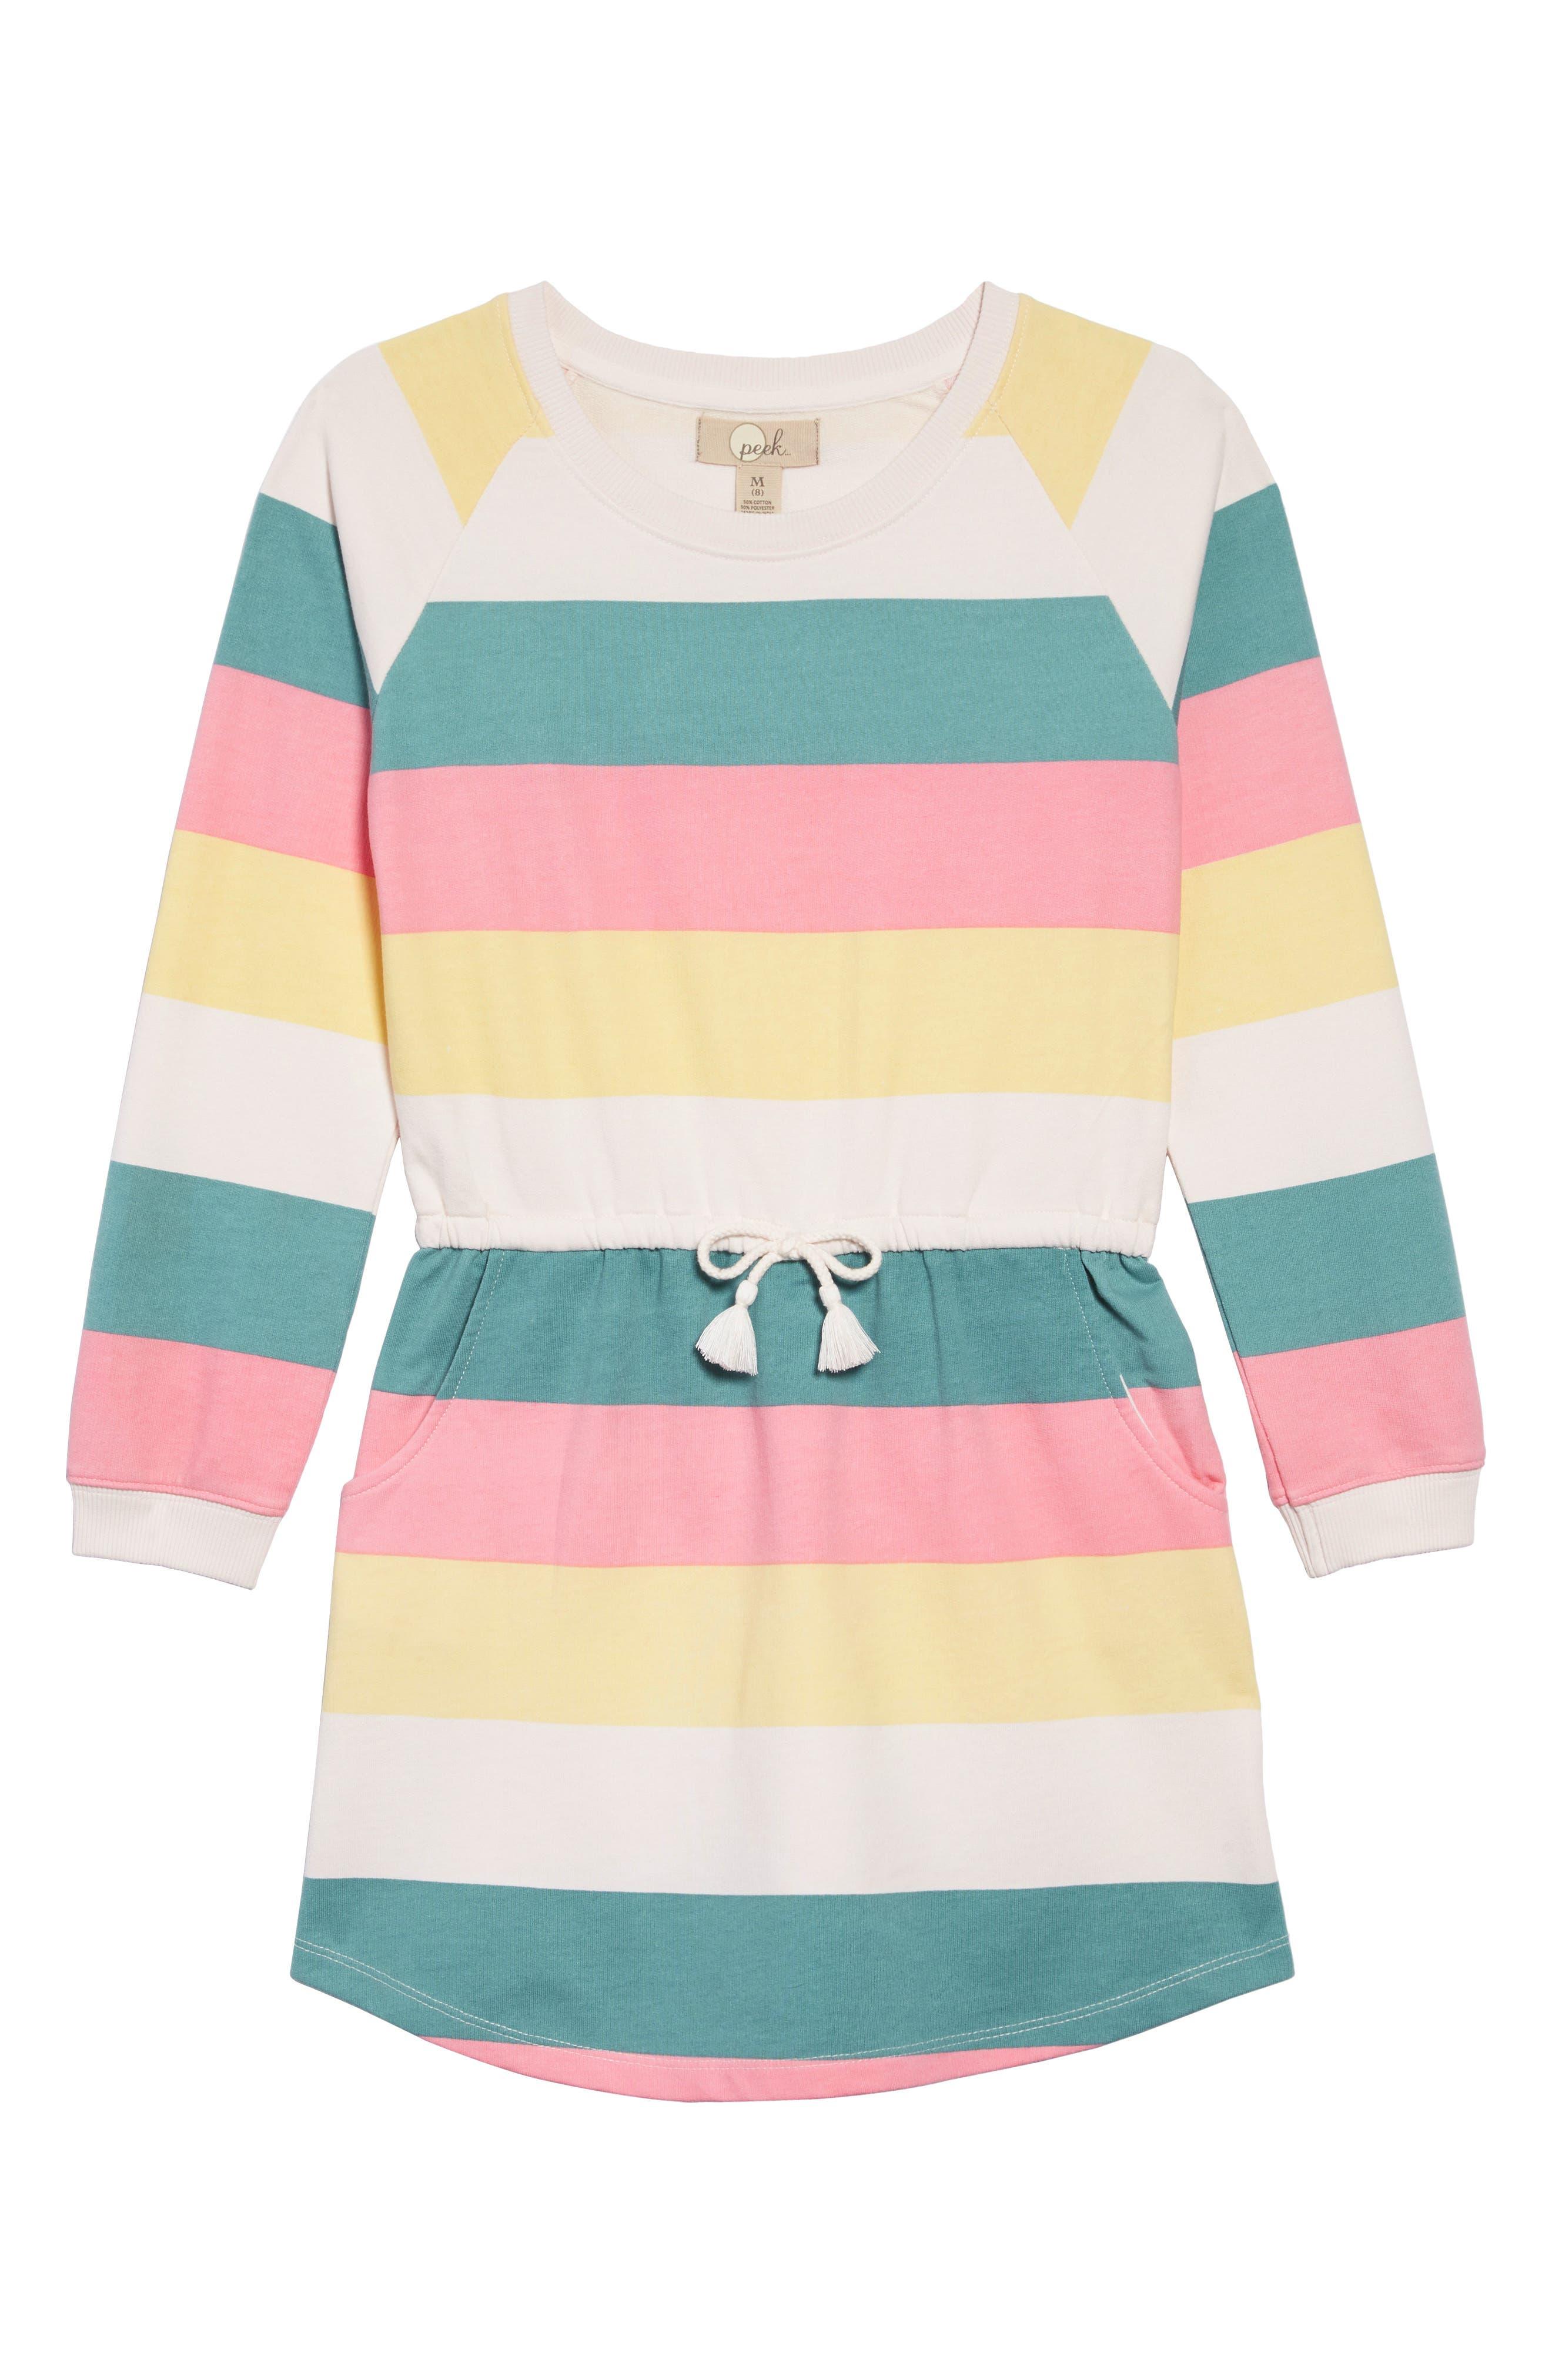 PEEK AREN'T YOU CURIOUS, Brynn Stripe Sweatshirt Dress, Main thumbnail 1, color, 650